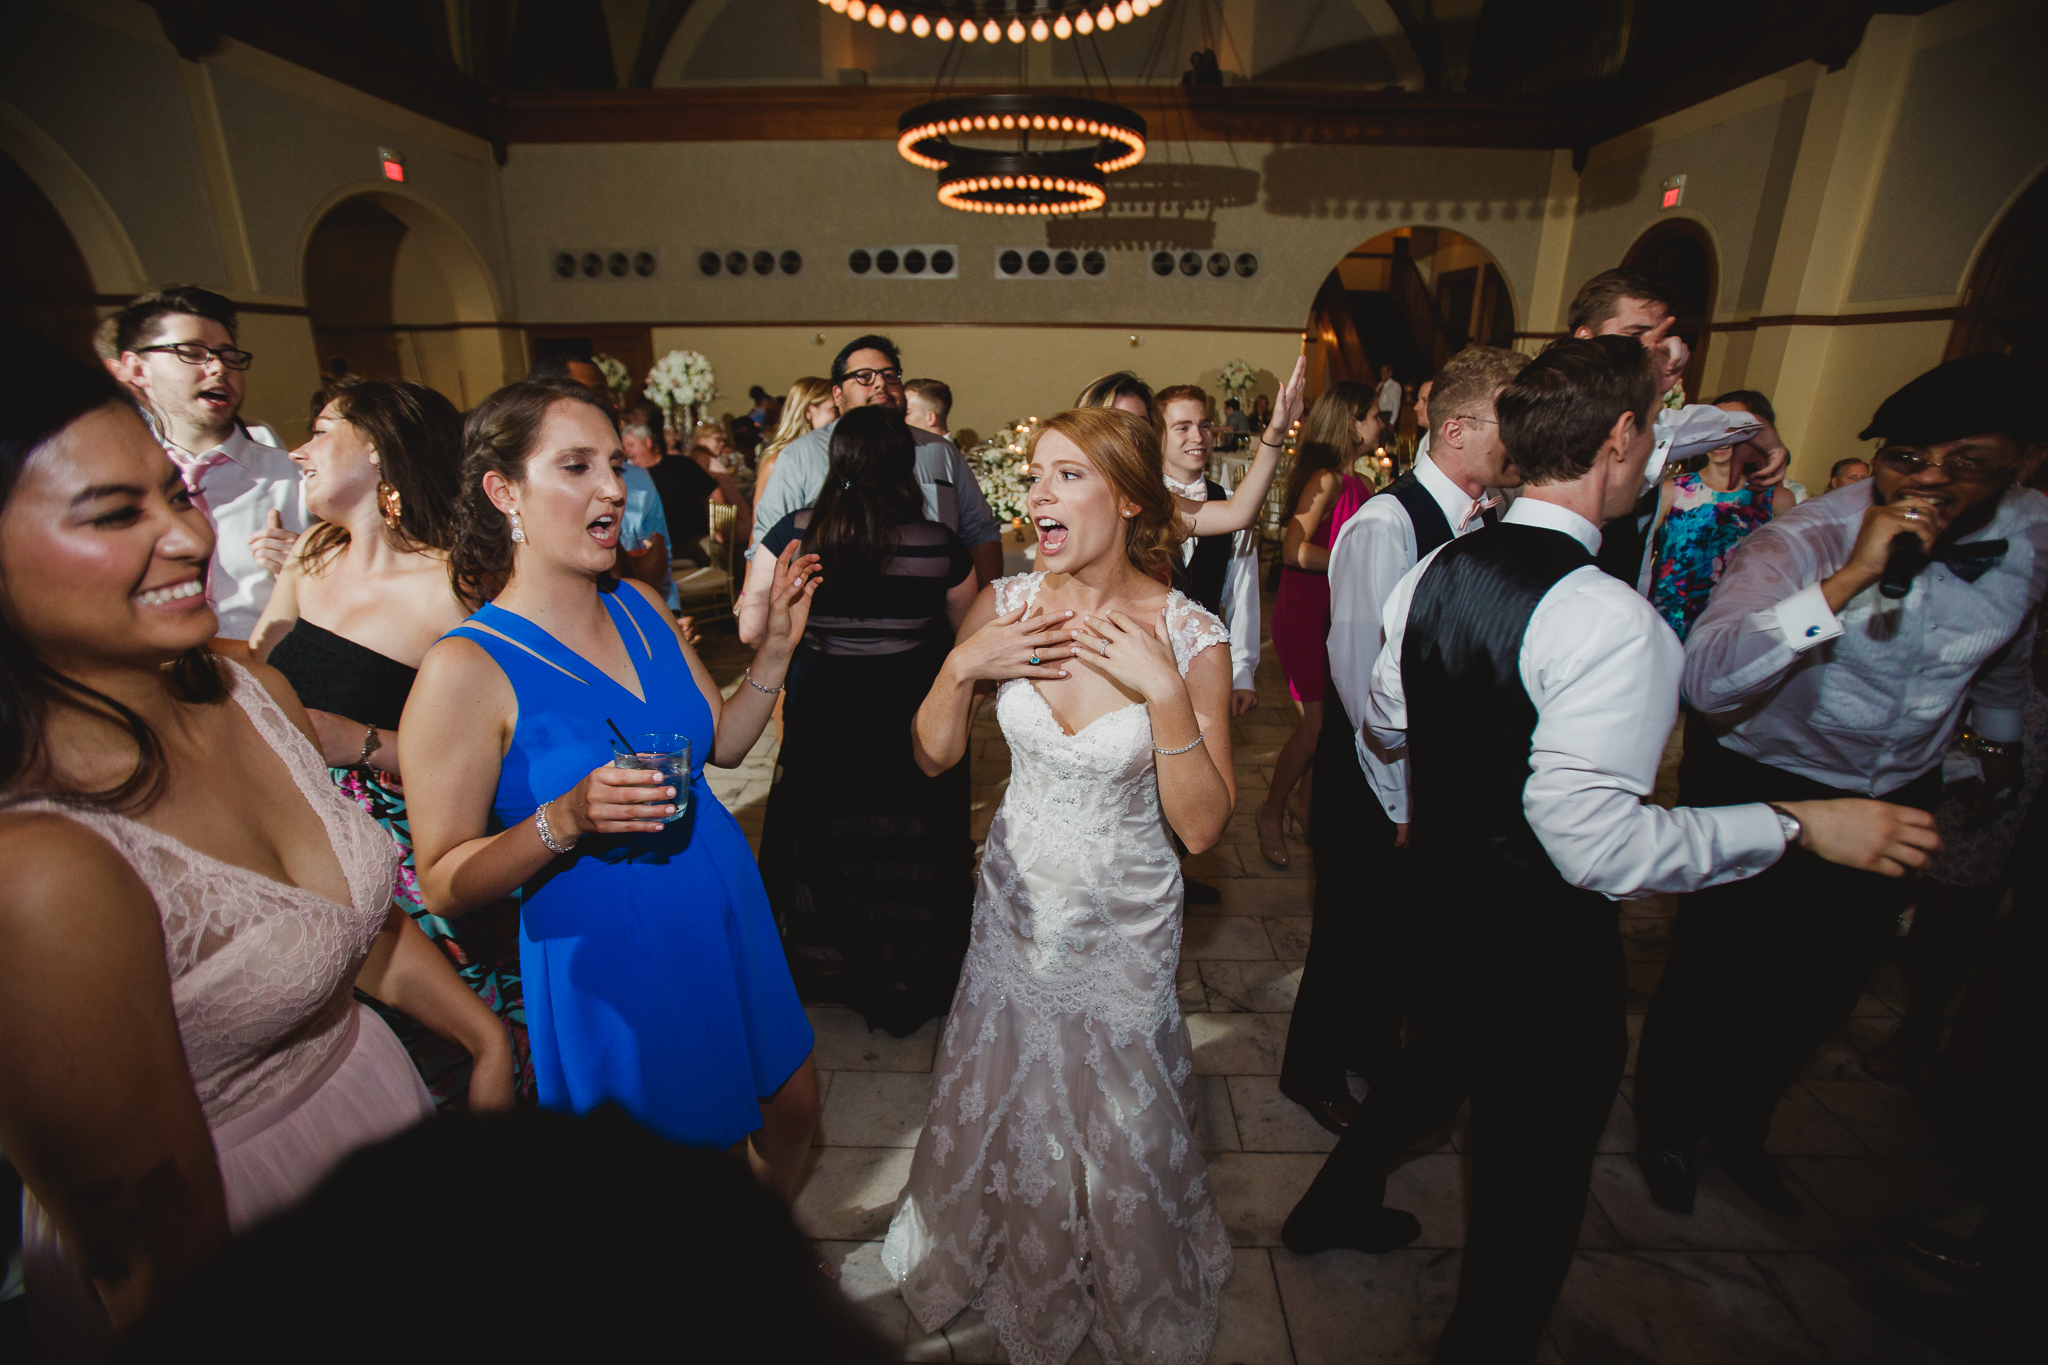 Michael and Kelly - the ashton depot - wedding DFW - wedding photographer- elizalde photography (136 of 150).jpg